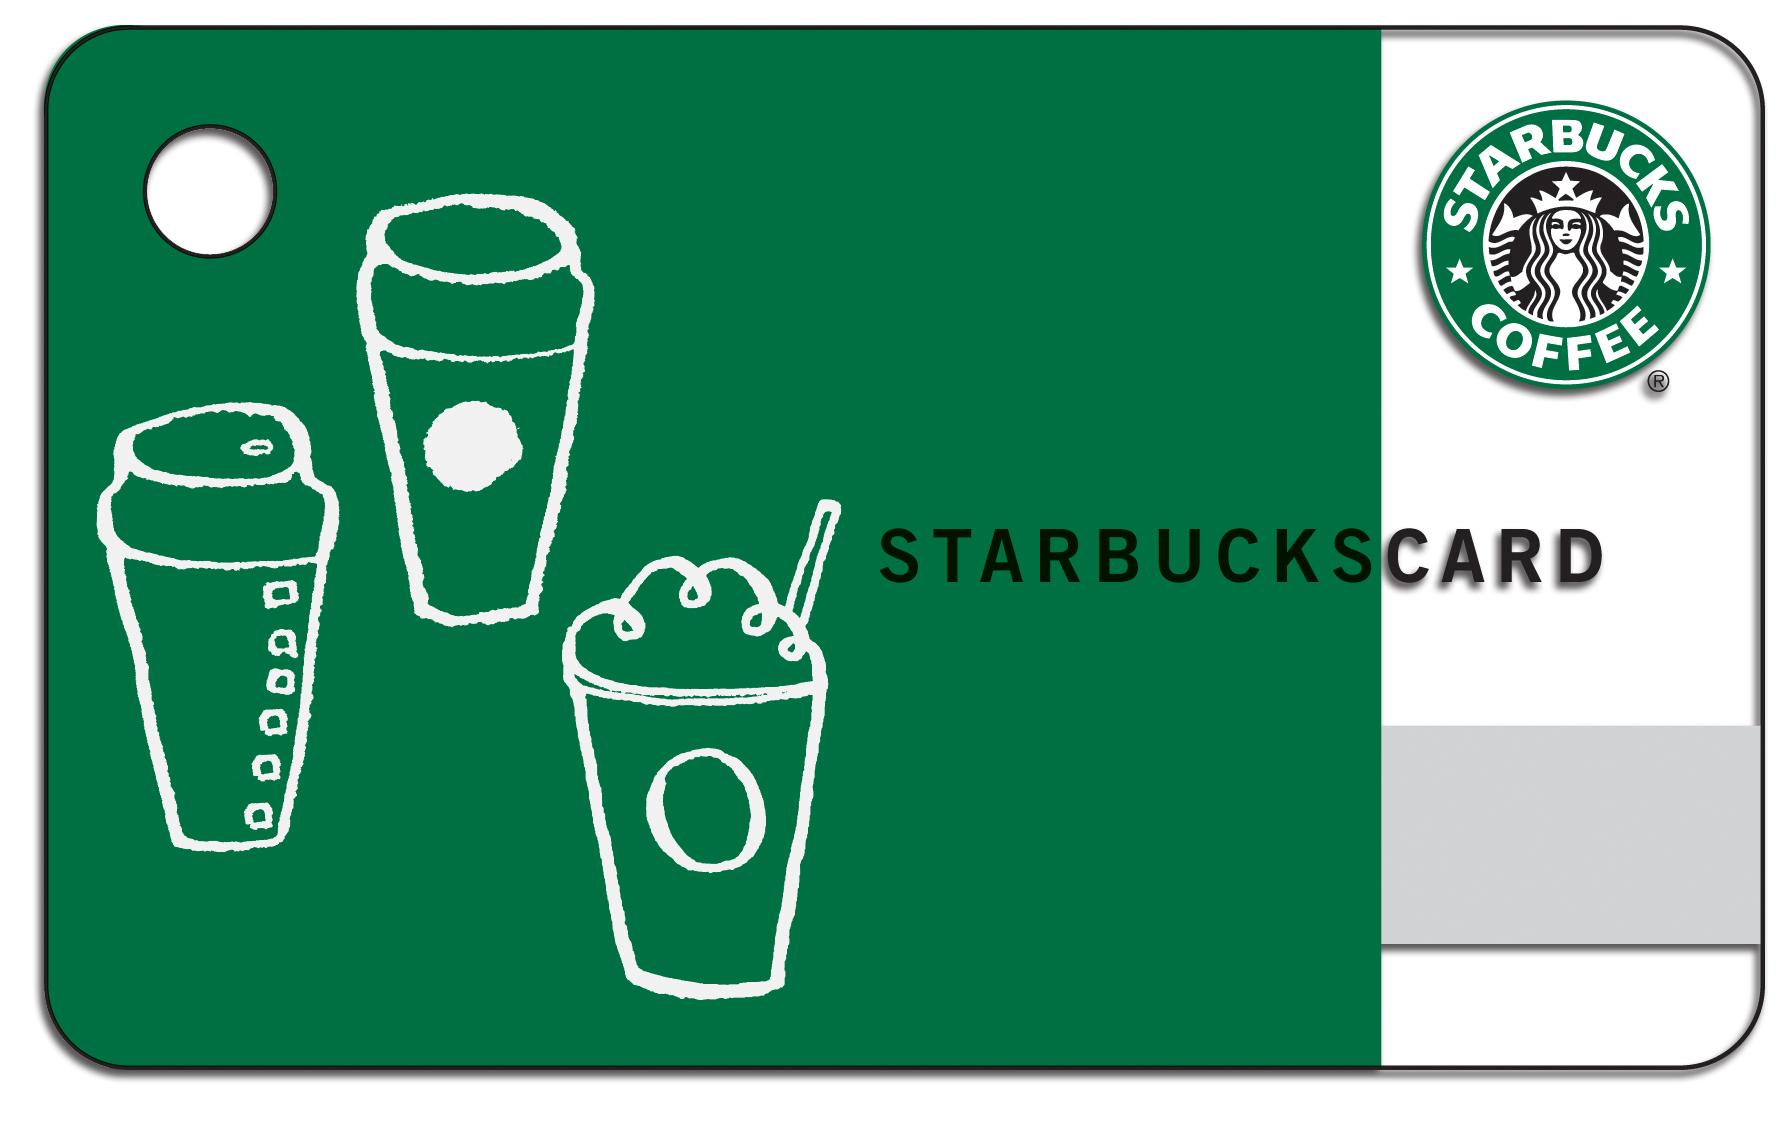 100 usd Starbucks eGift Card